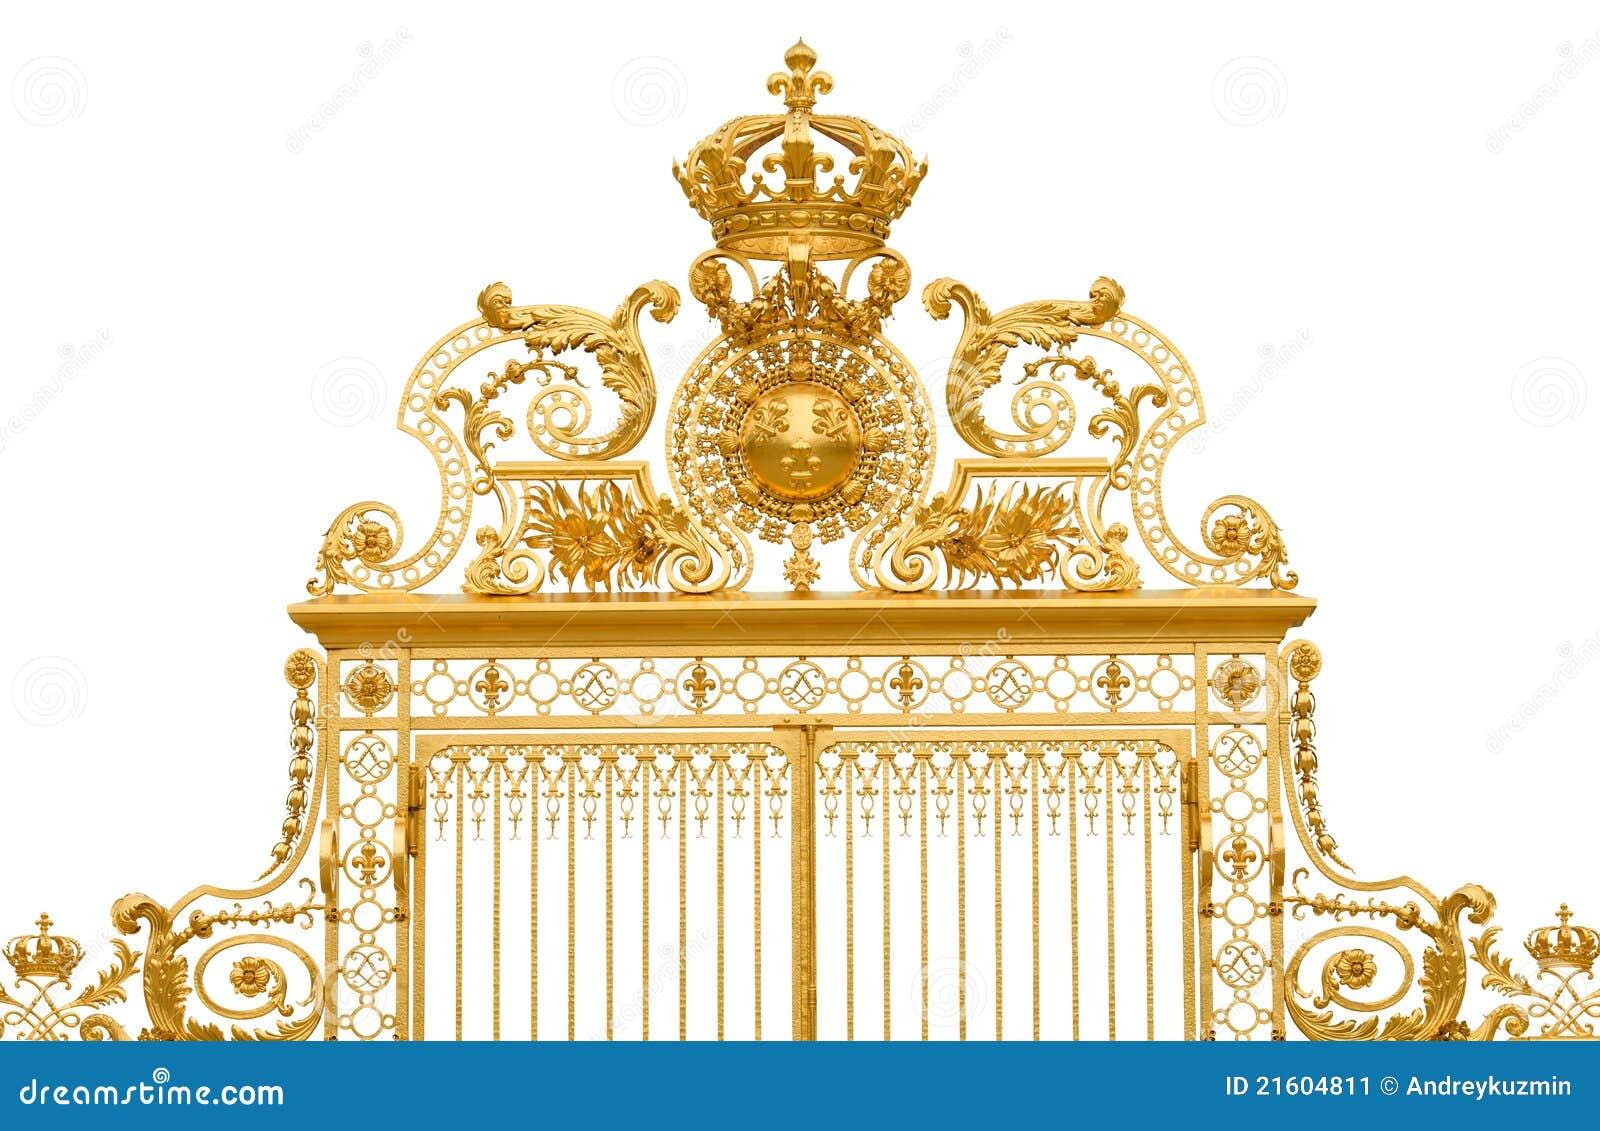 Isolated golden... Gates Of Heaven Design